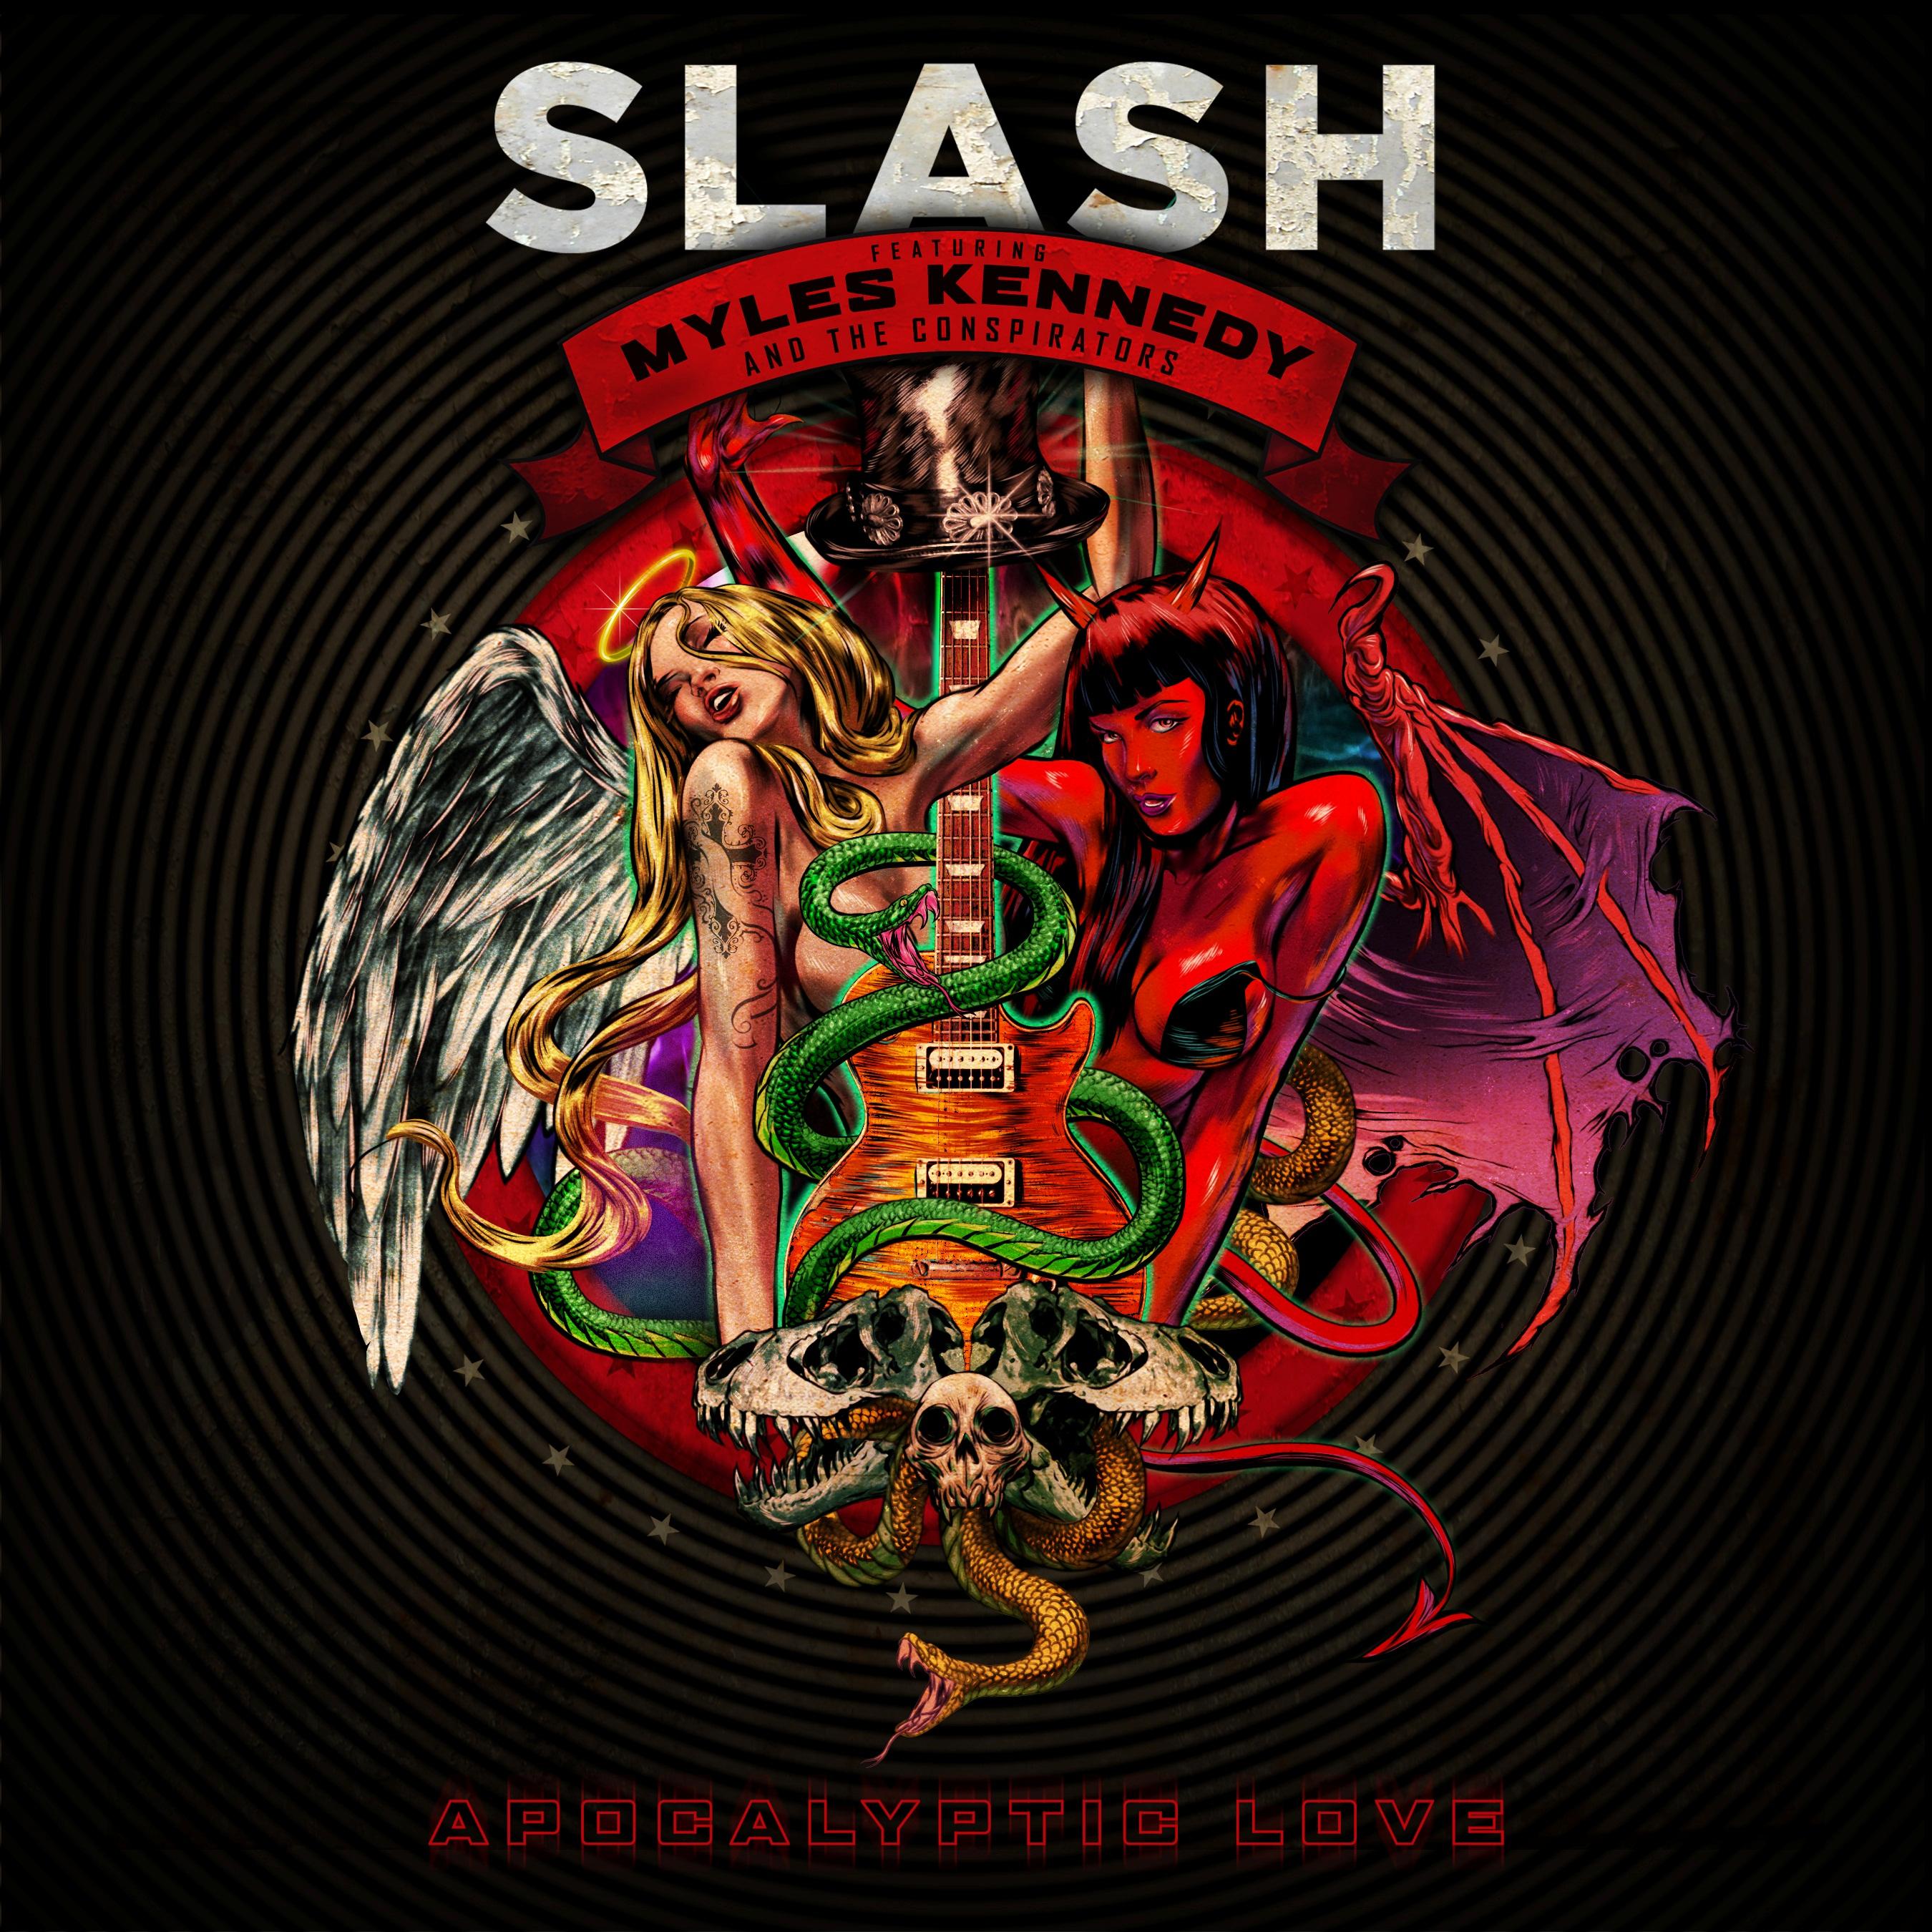 Die besten Hard Rock-Alben 2012